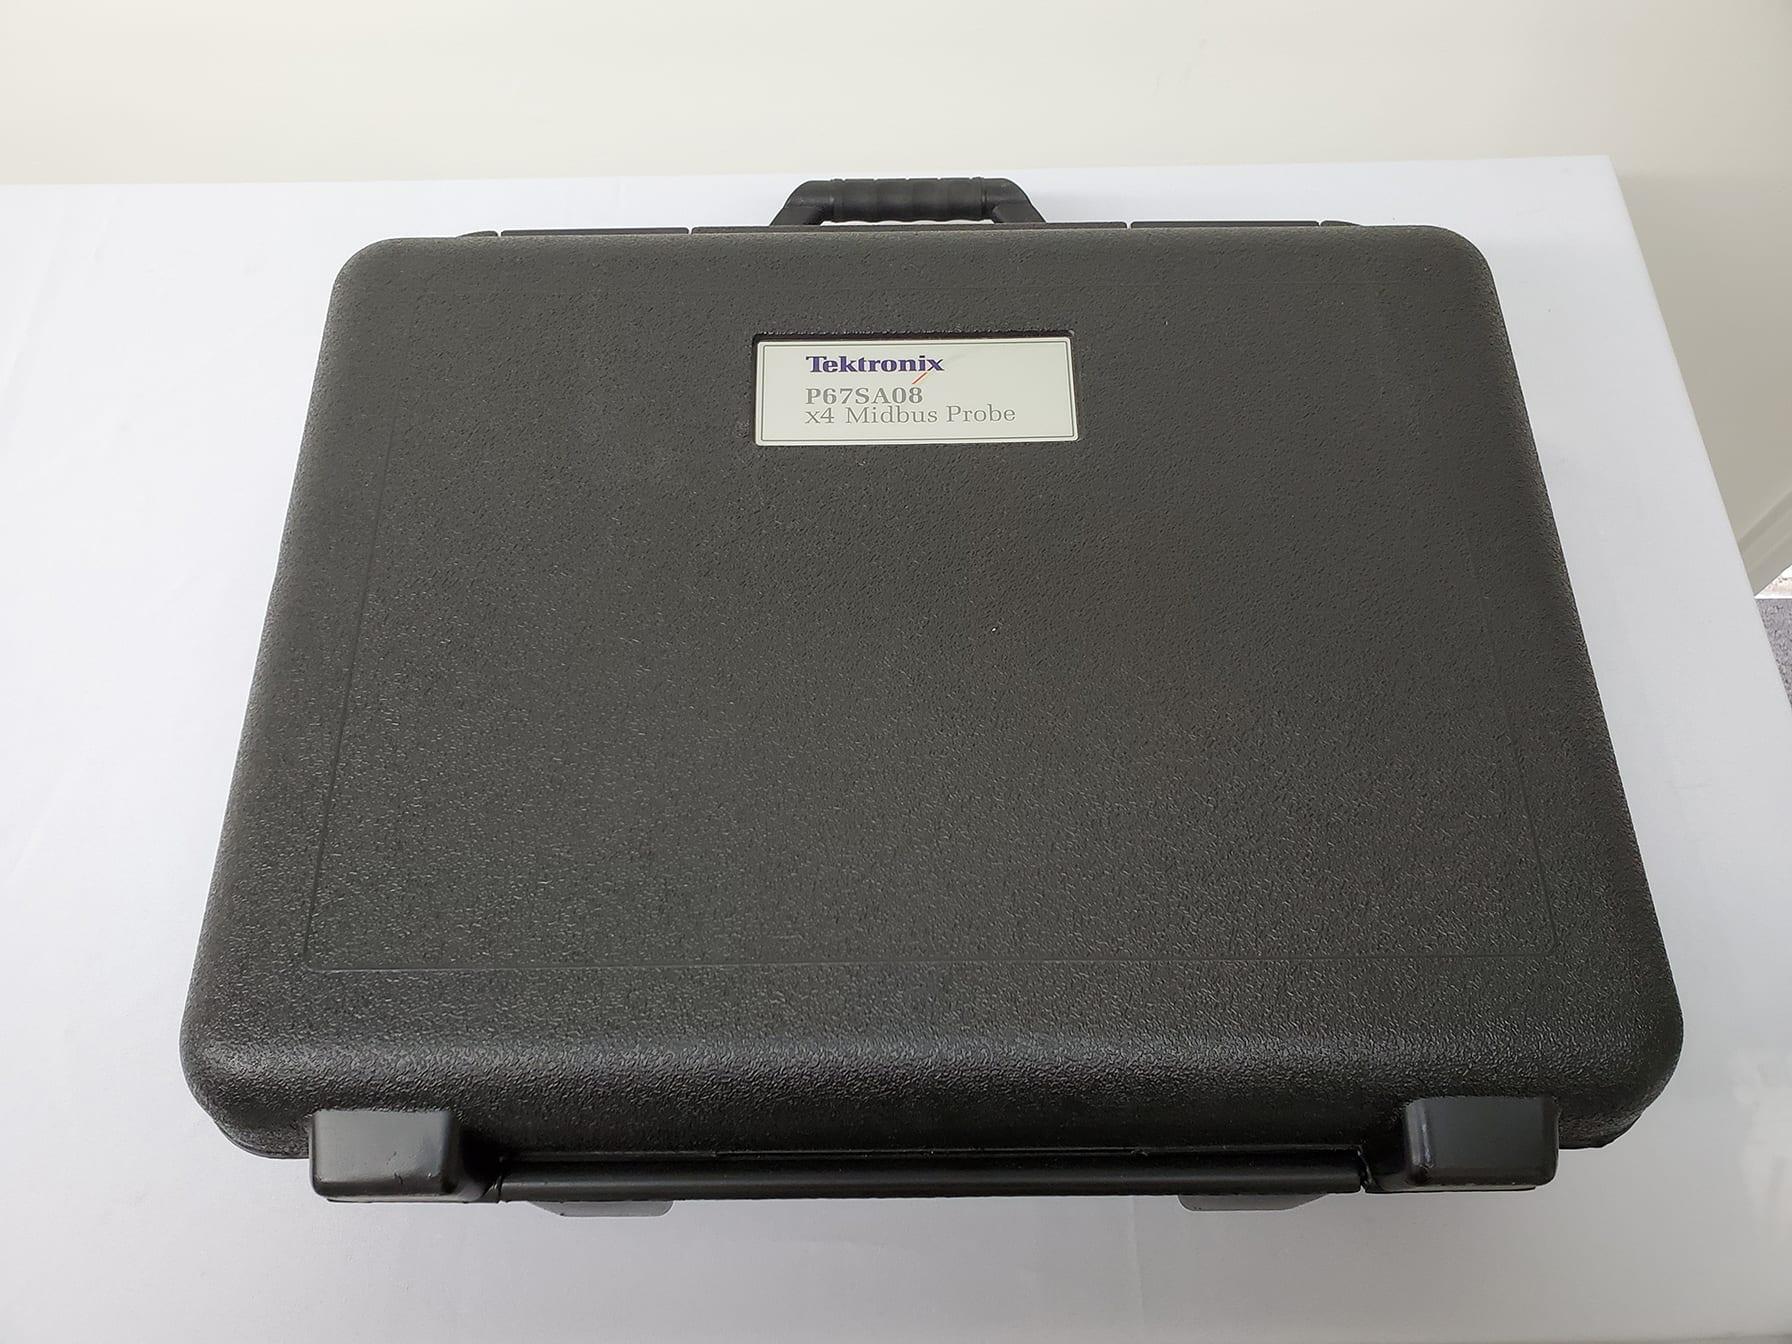 Buy Online Tektronix P67SA08 4 Midbus Probe